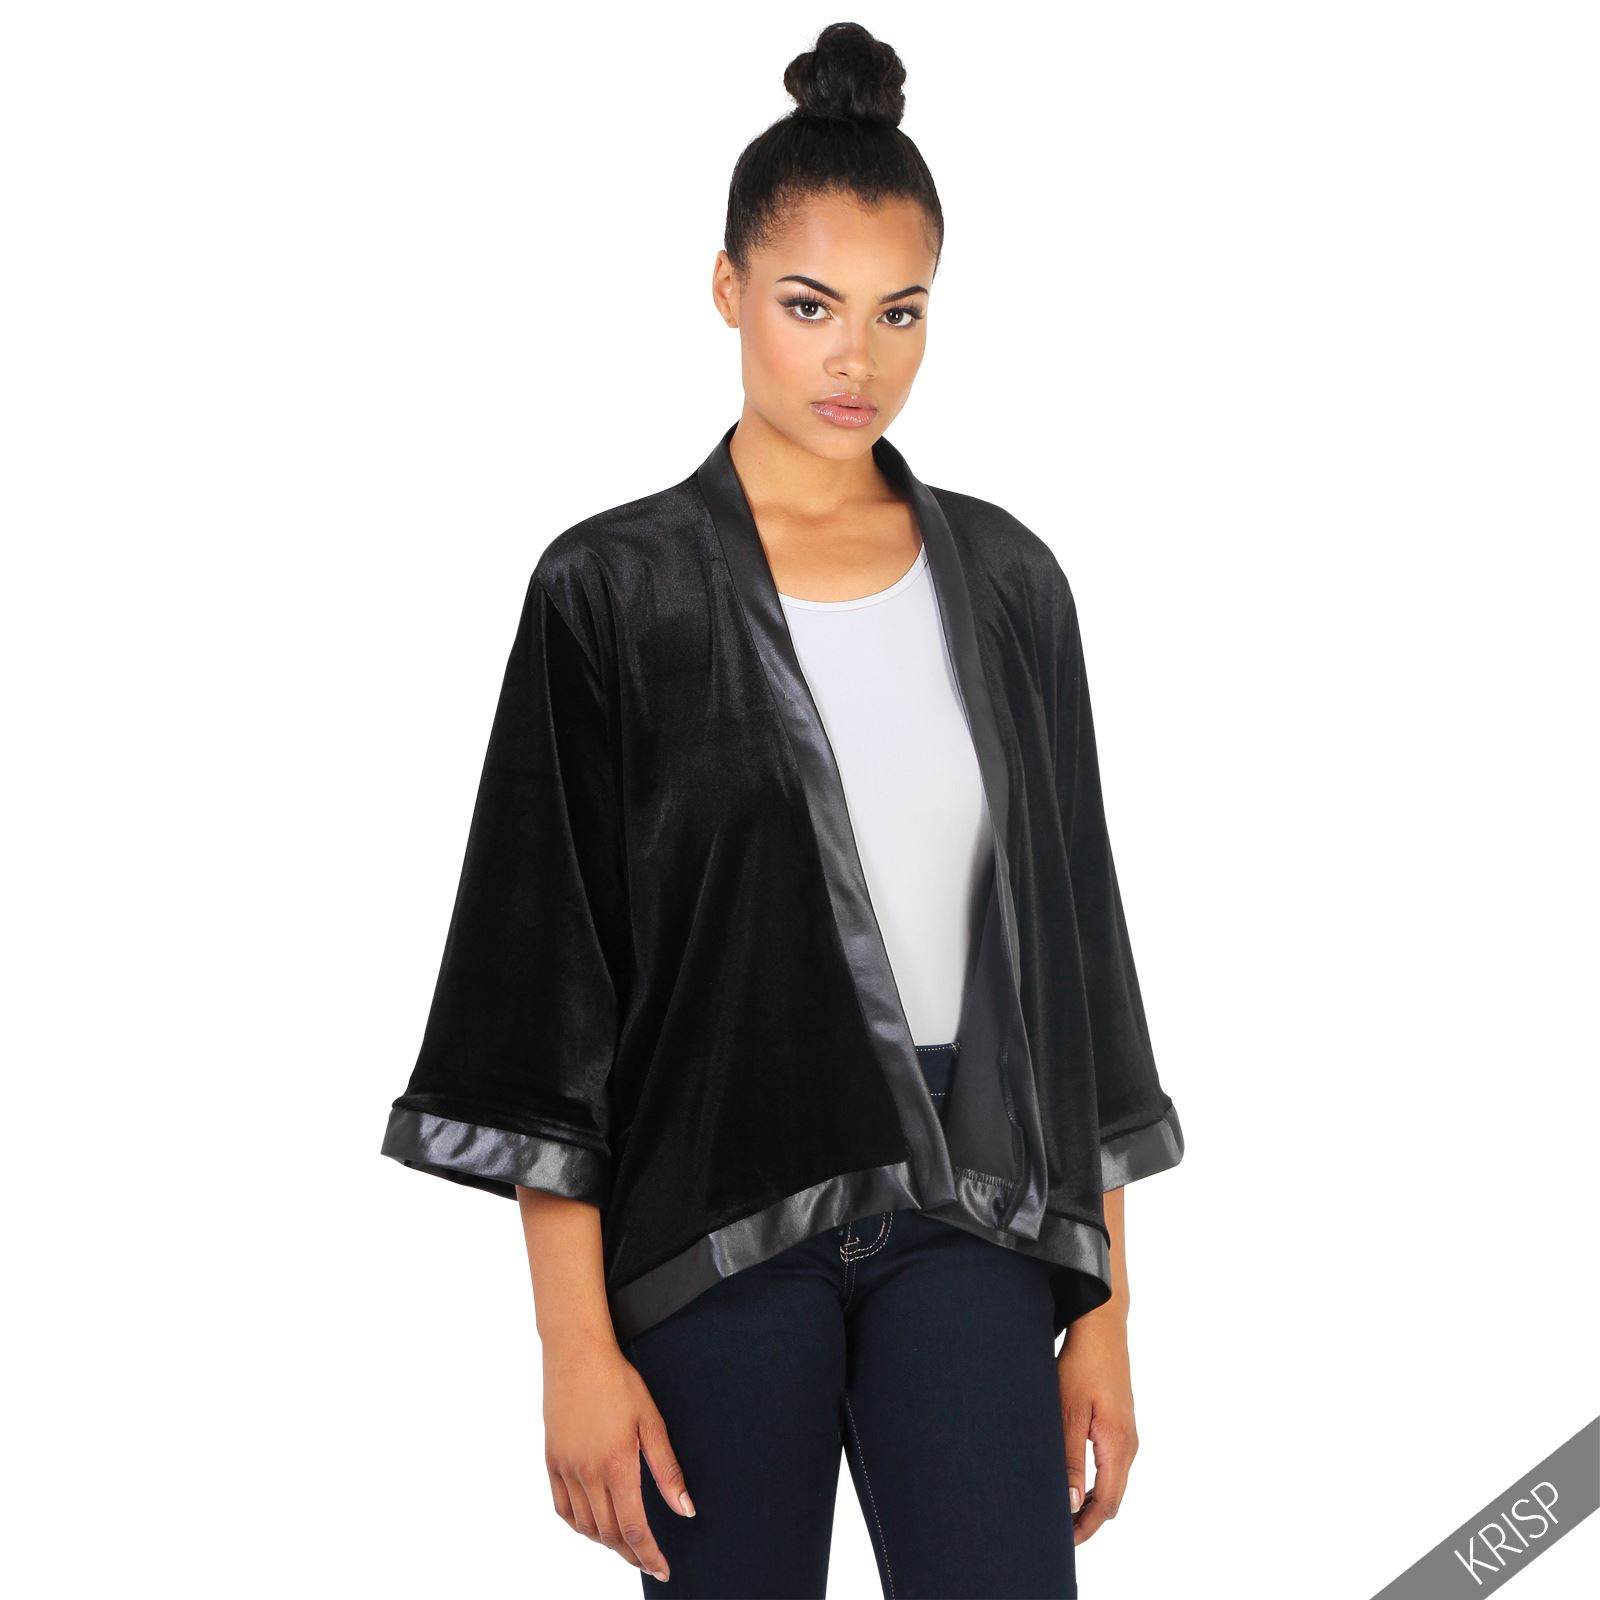 Damen offene samt satin jacke 3 4 arm kimono bluse blazer - Kimono jacke damen ...